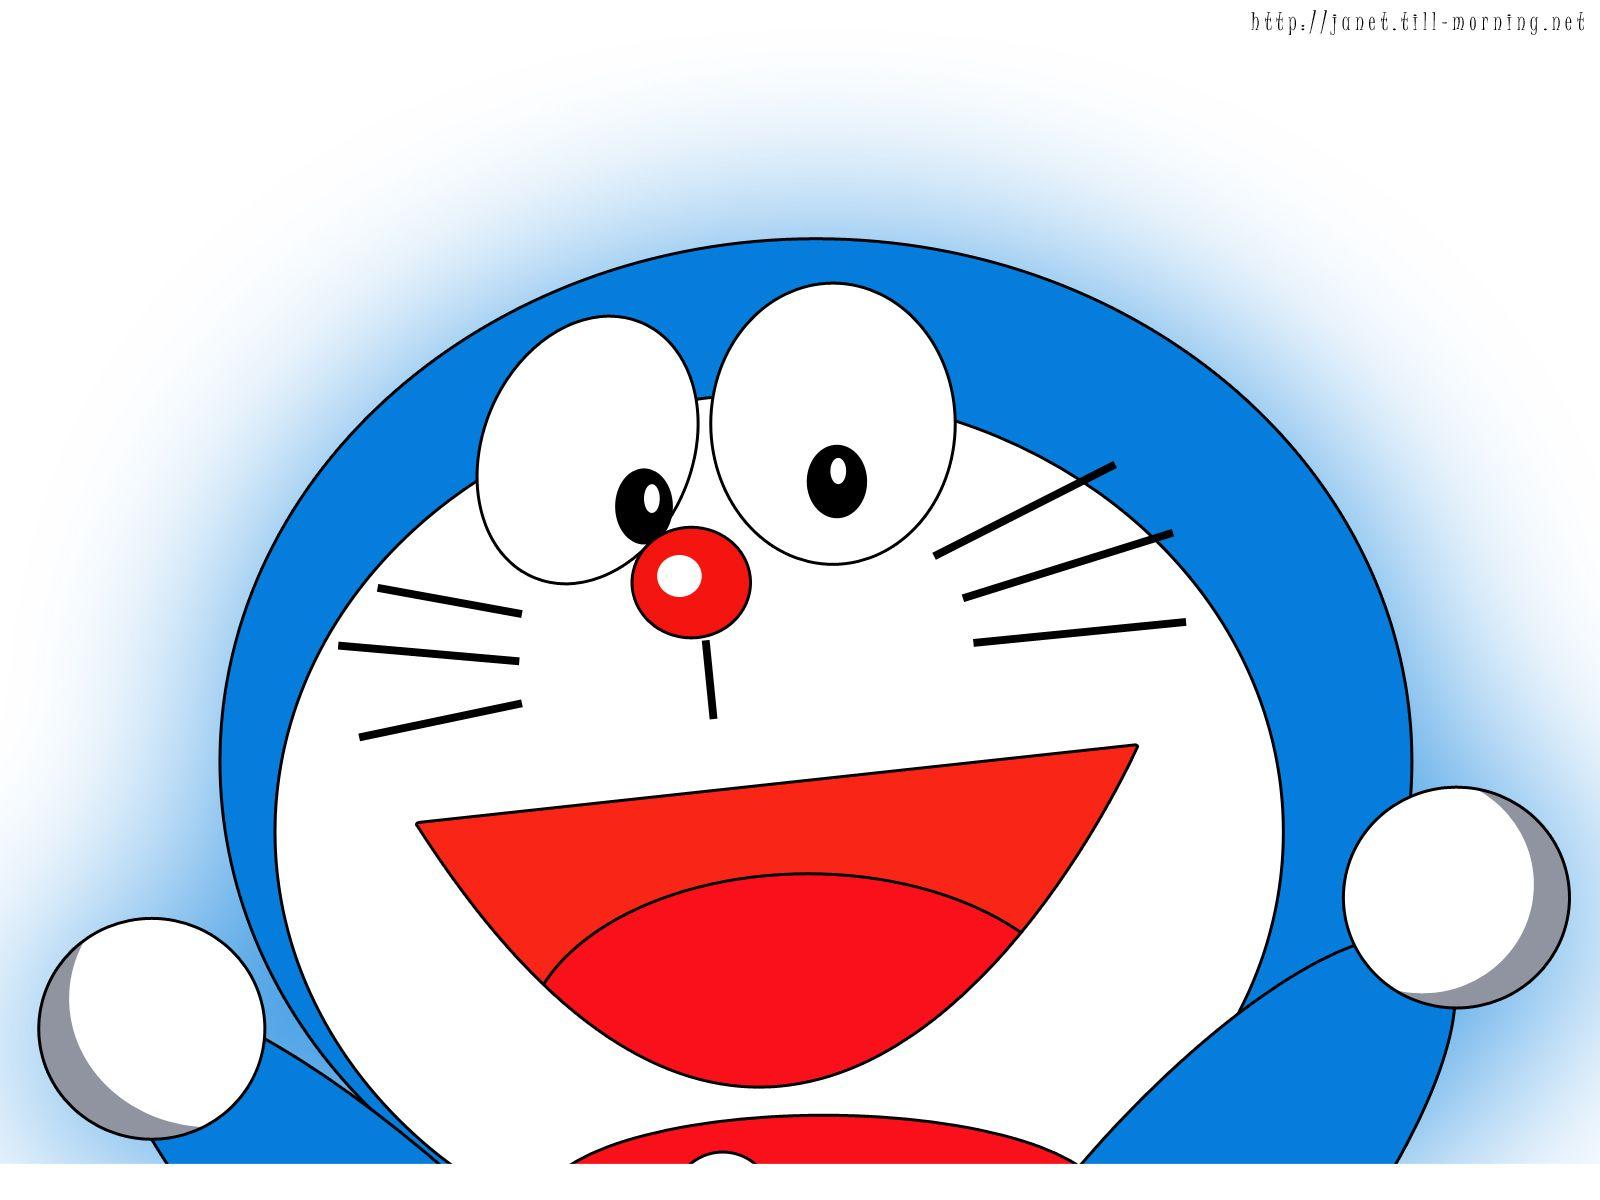 Wallpaper Of Doraemon Doraemon wallpapers, Cartoon